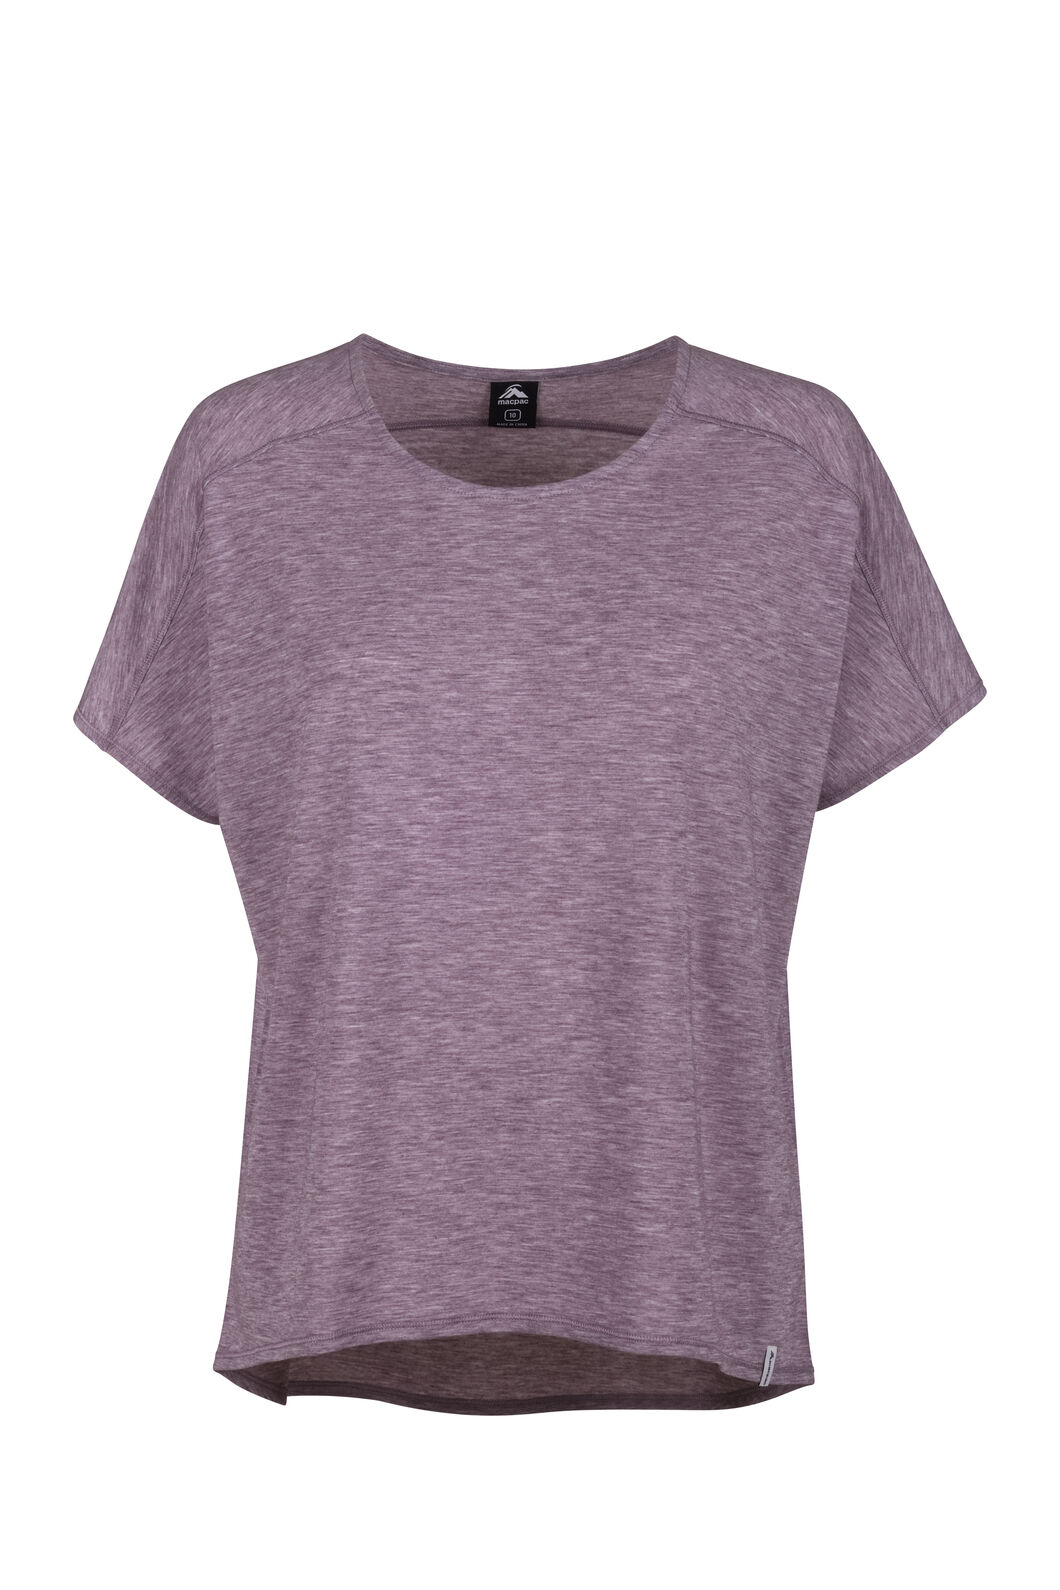 Macpac Eva Short Sleeve Tee - Women's, Fudge, hi-res